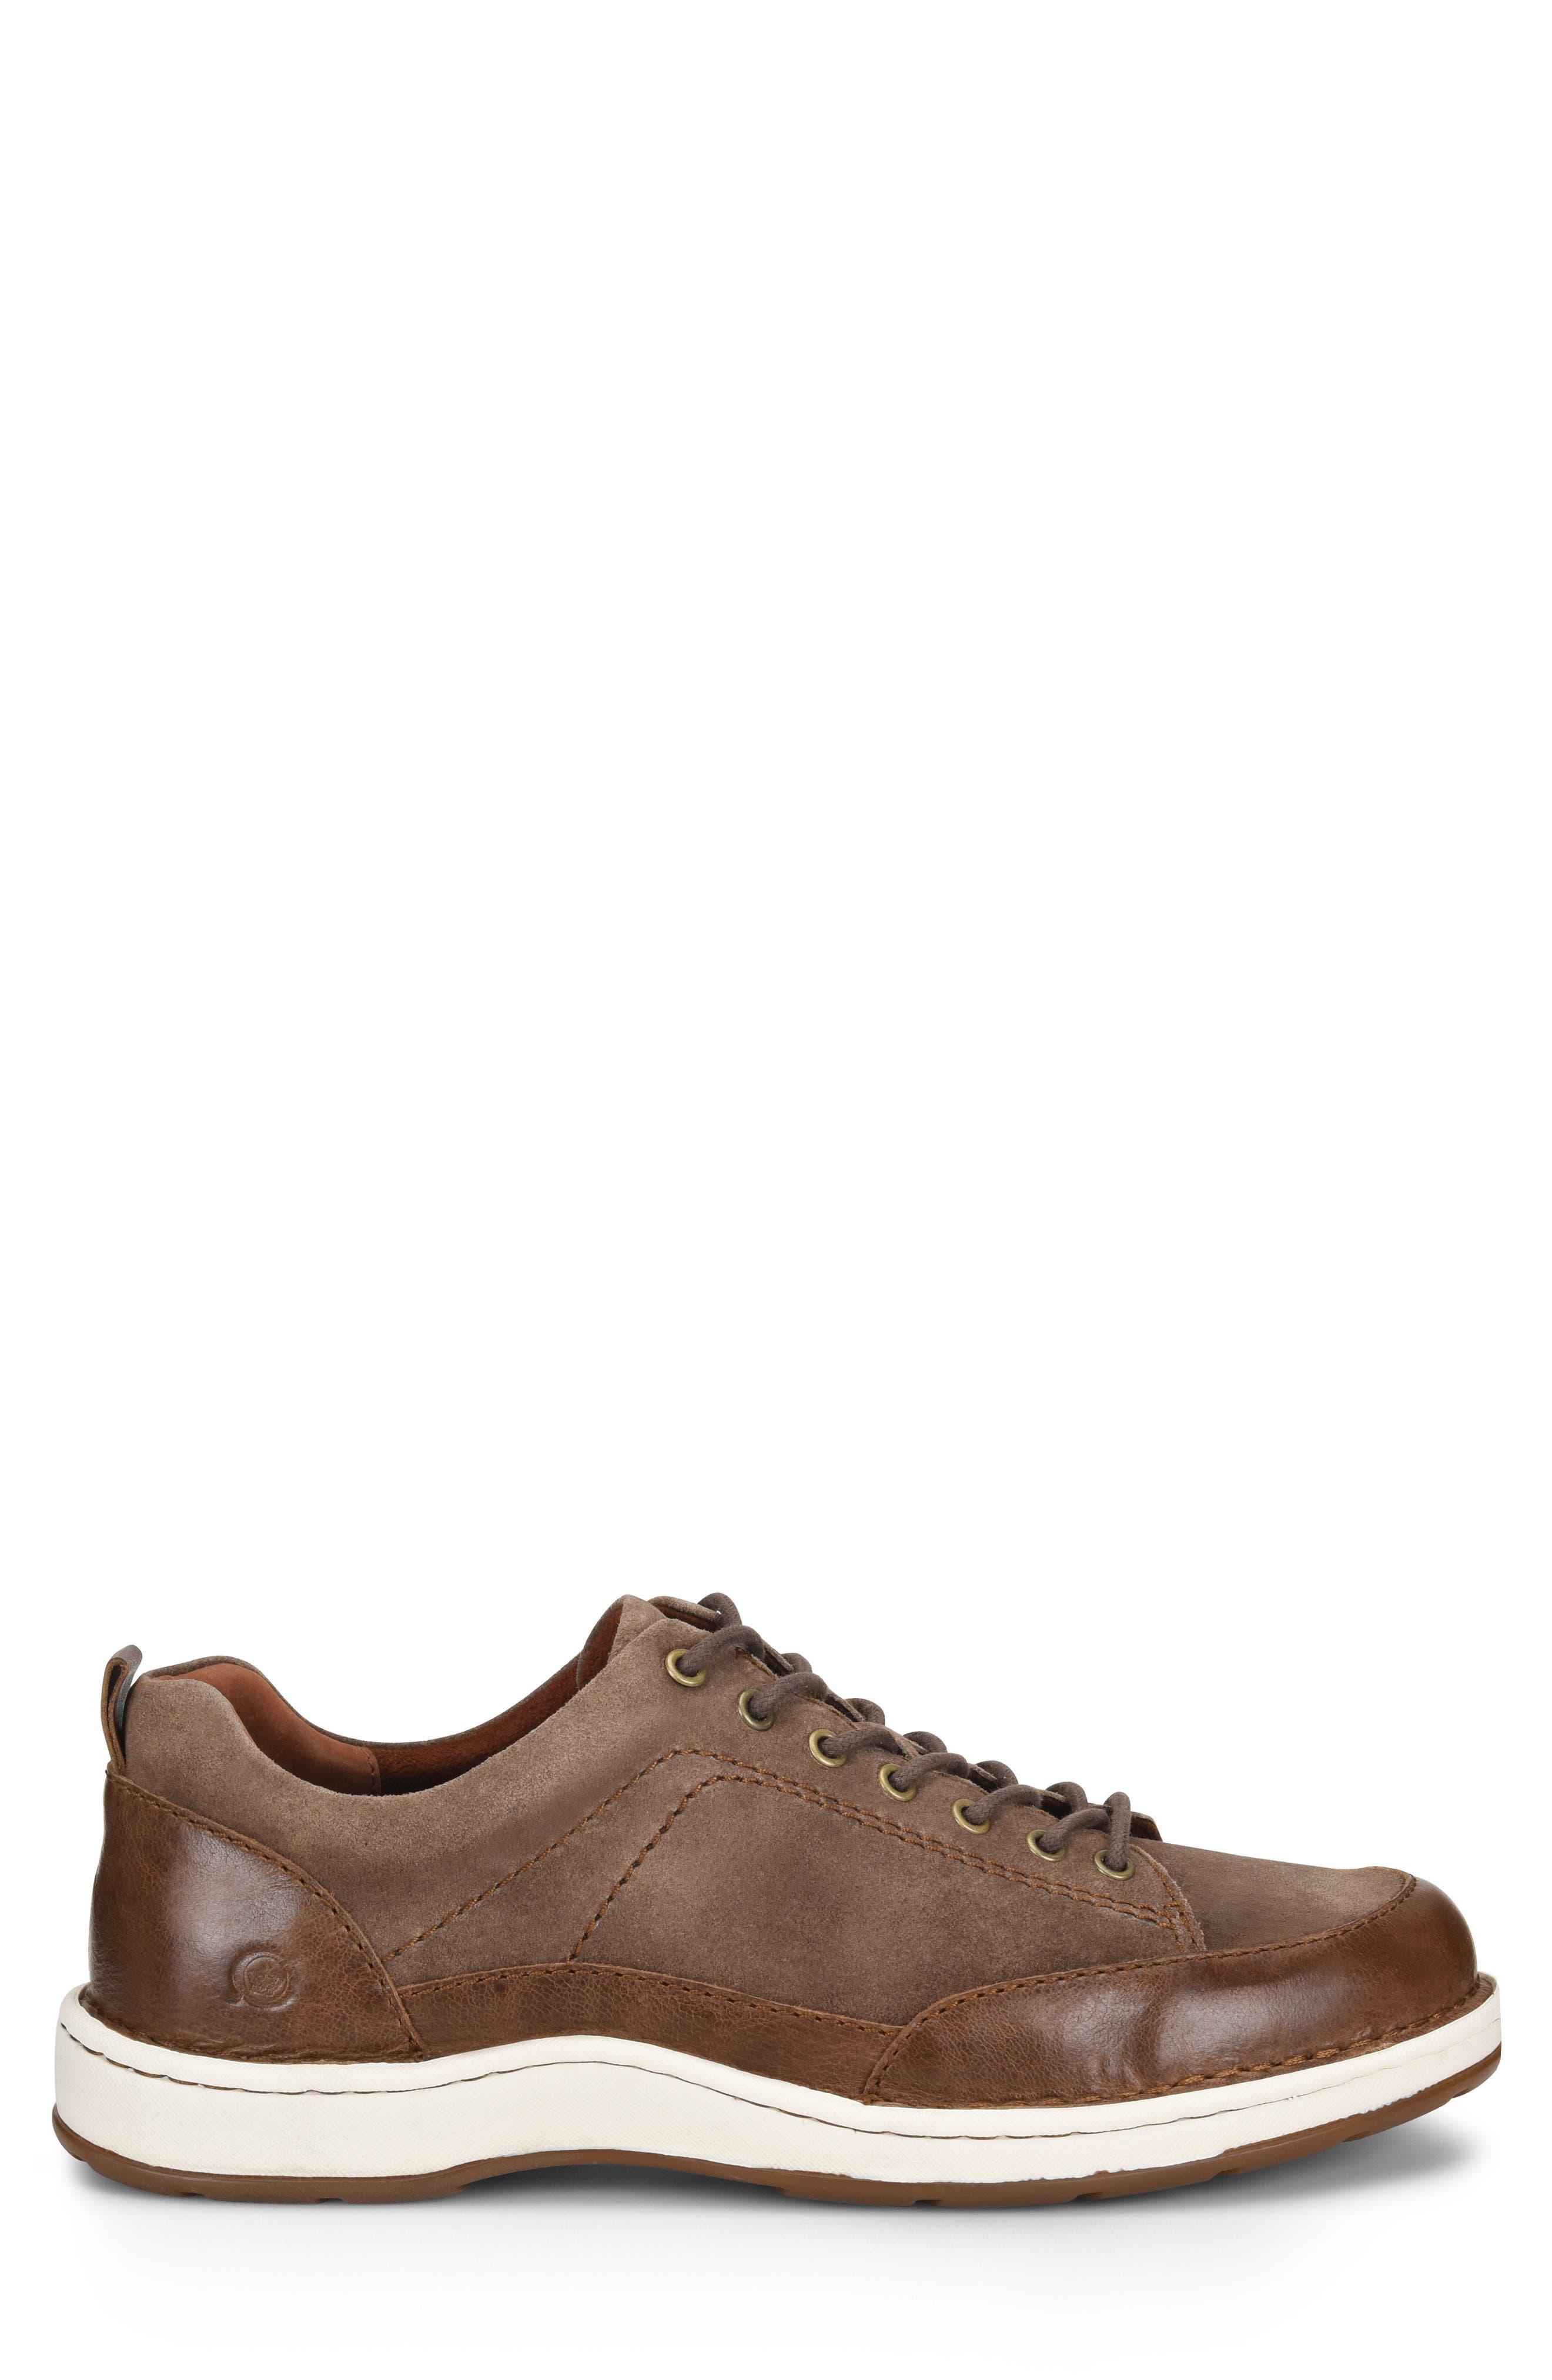 Kruger Moc Toe Sneaker,                             Alternate thumbnail 3, color,                             TAUPE LEATHER